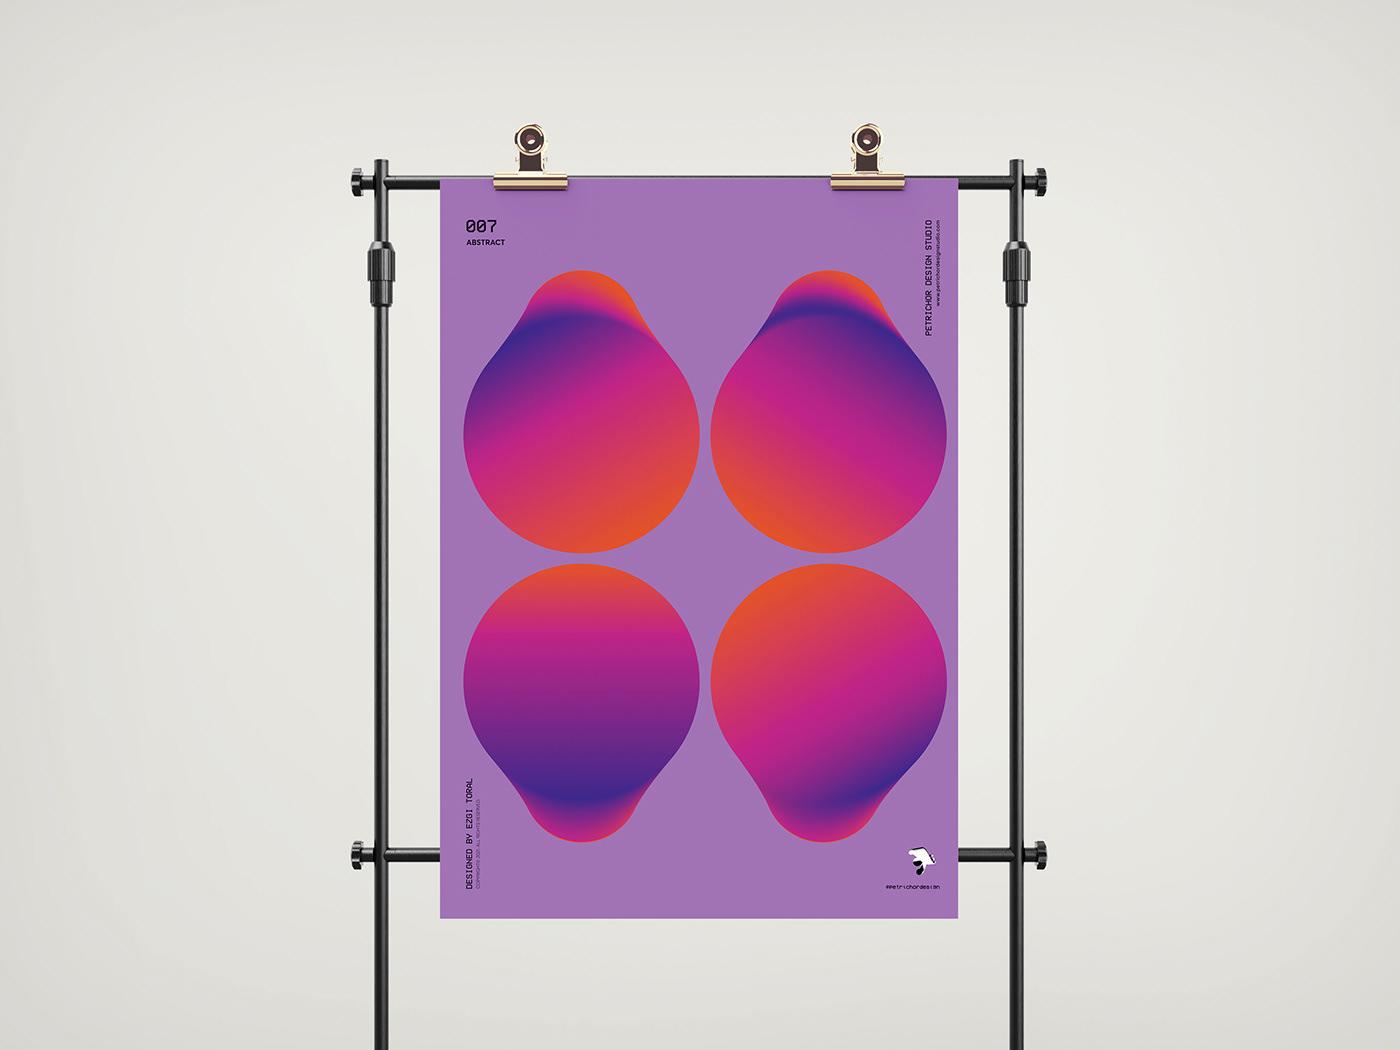 art design etsy graphic design  Illustrator petrichor Poster Design sanat shopier studio